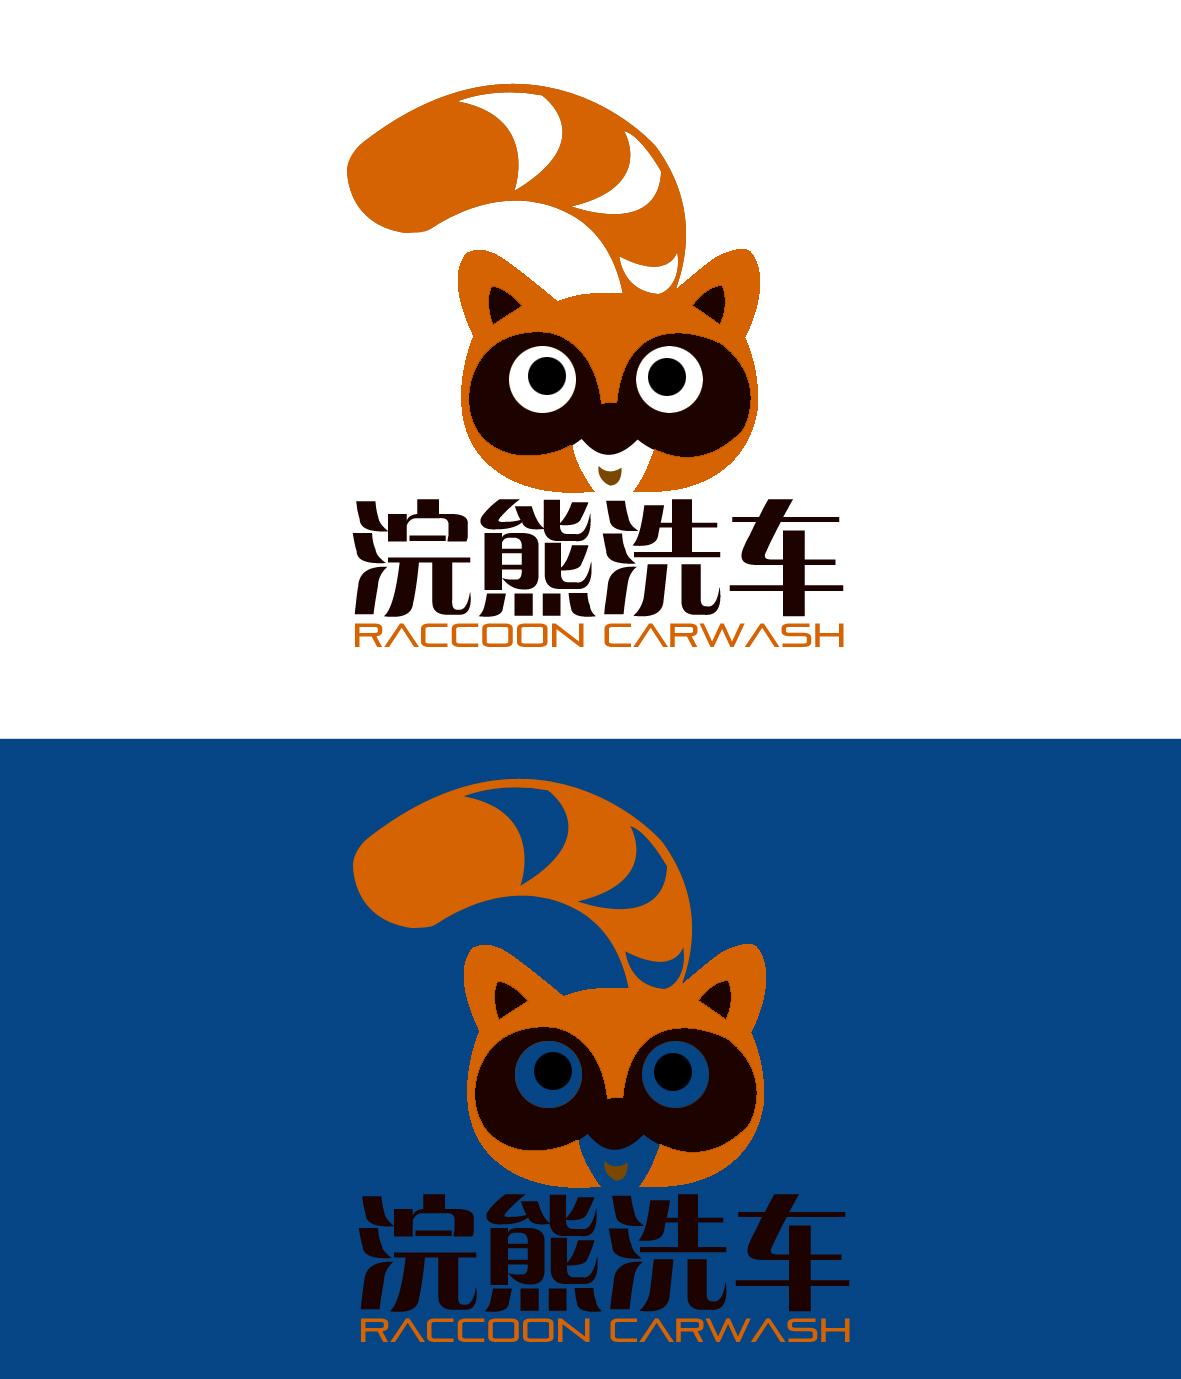 onsite carwash service logo design-- 上门洗车服务logo设计